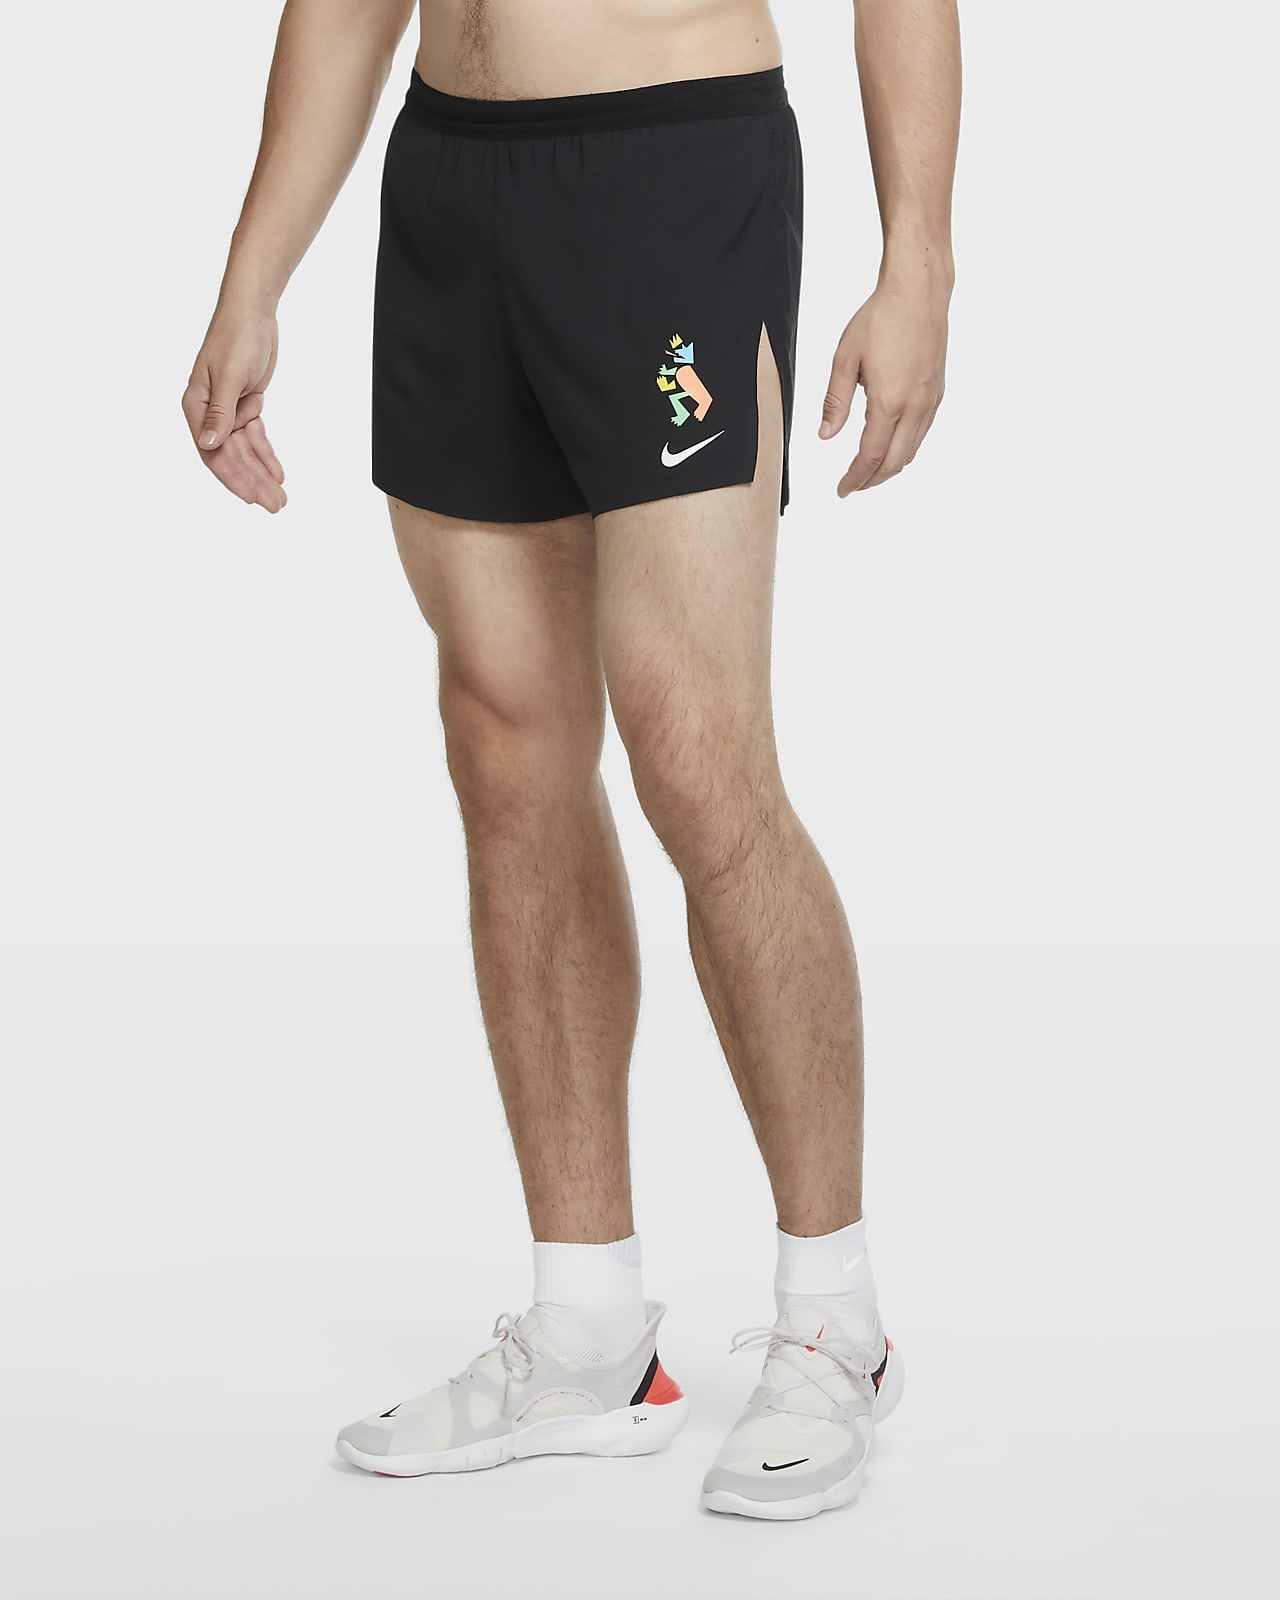 Nike AeroSwift Berlin Men's 10cm (approx.) Running Shorts